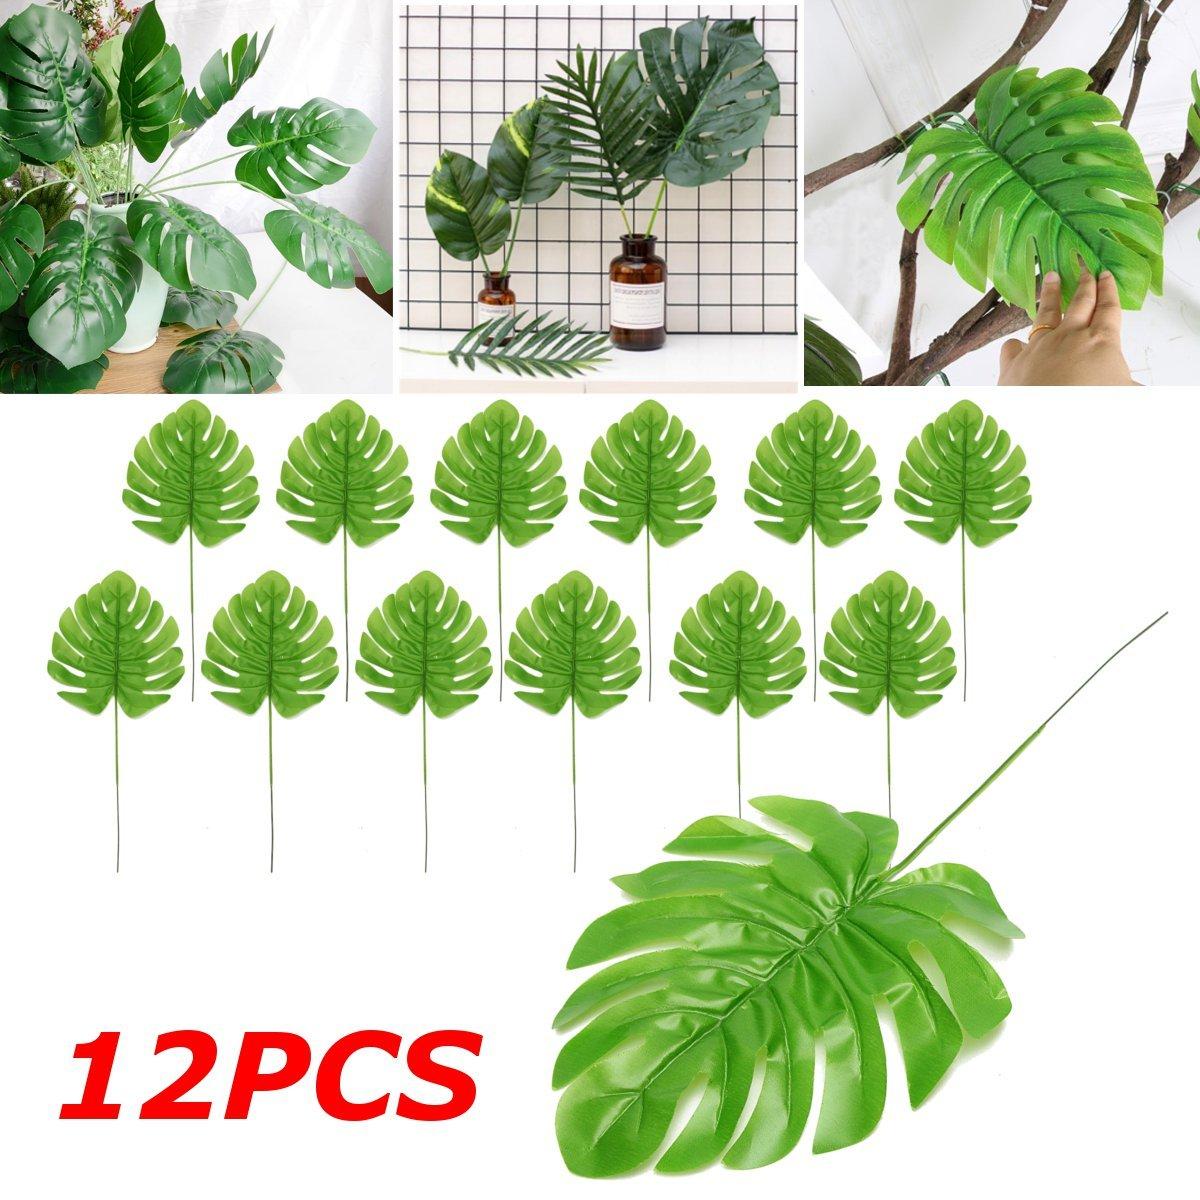 12Pcs Artificial Palm Fern Turtle Leaf Plant Tree Branch Green Wedding Home Decor